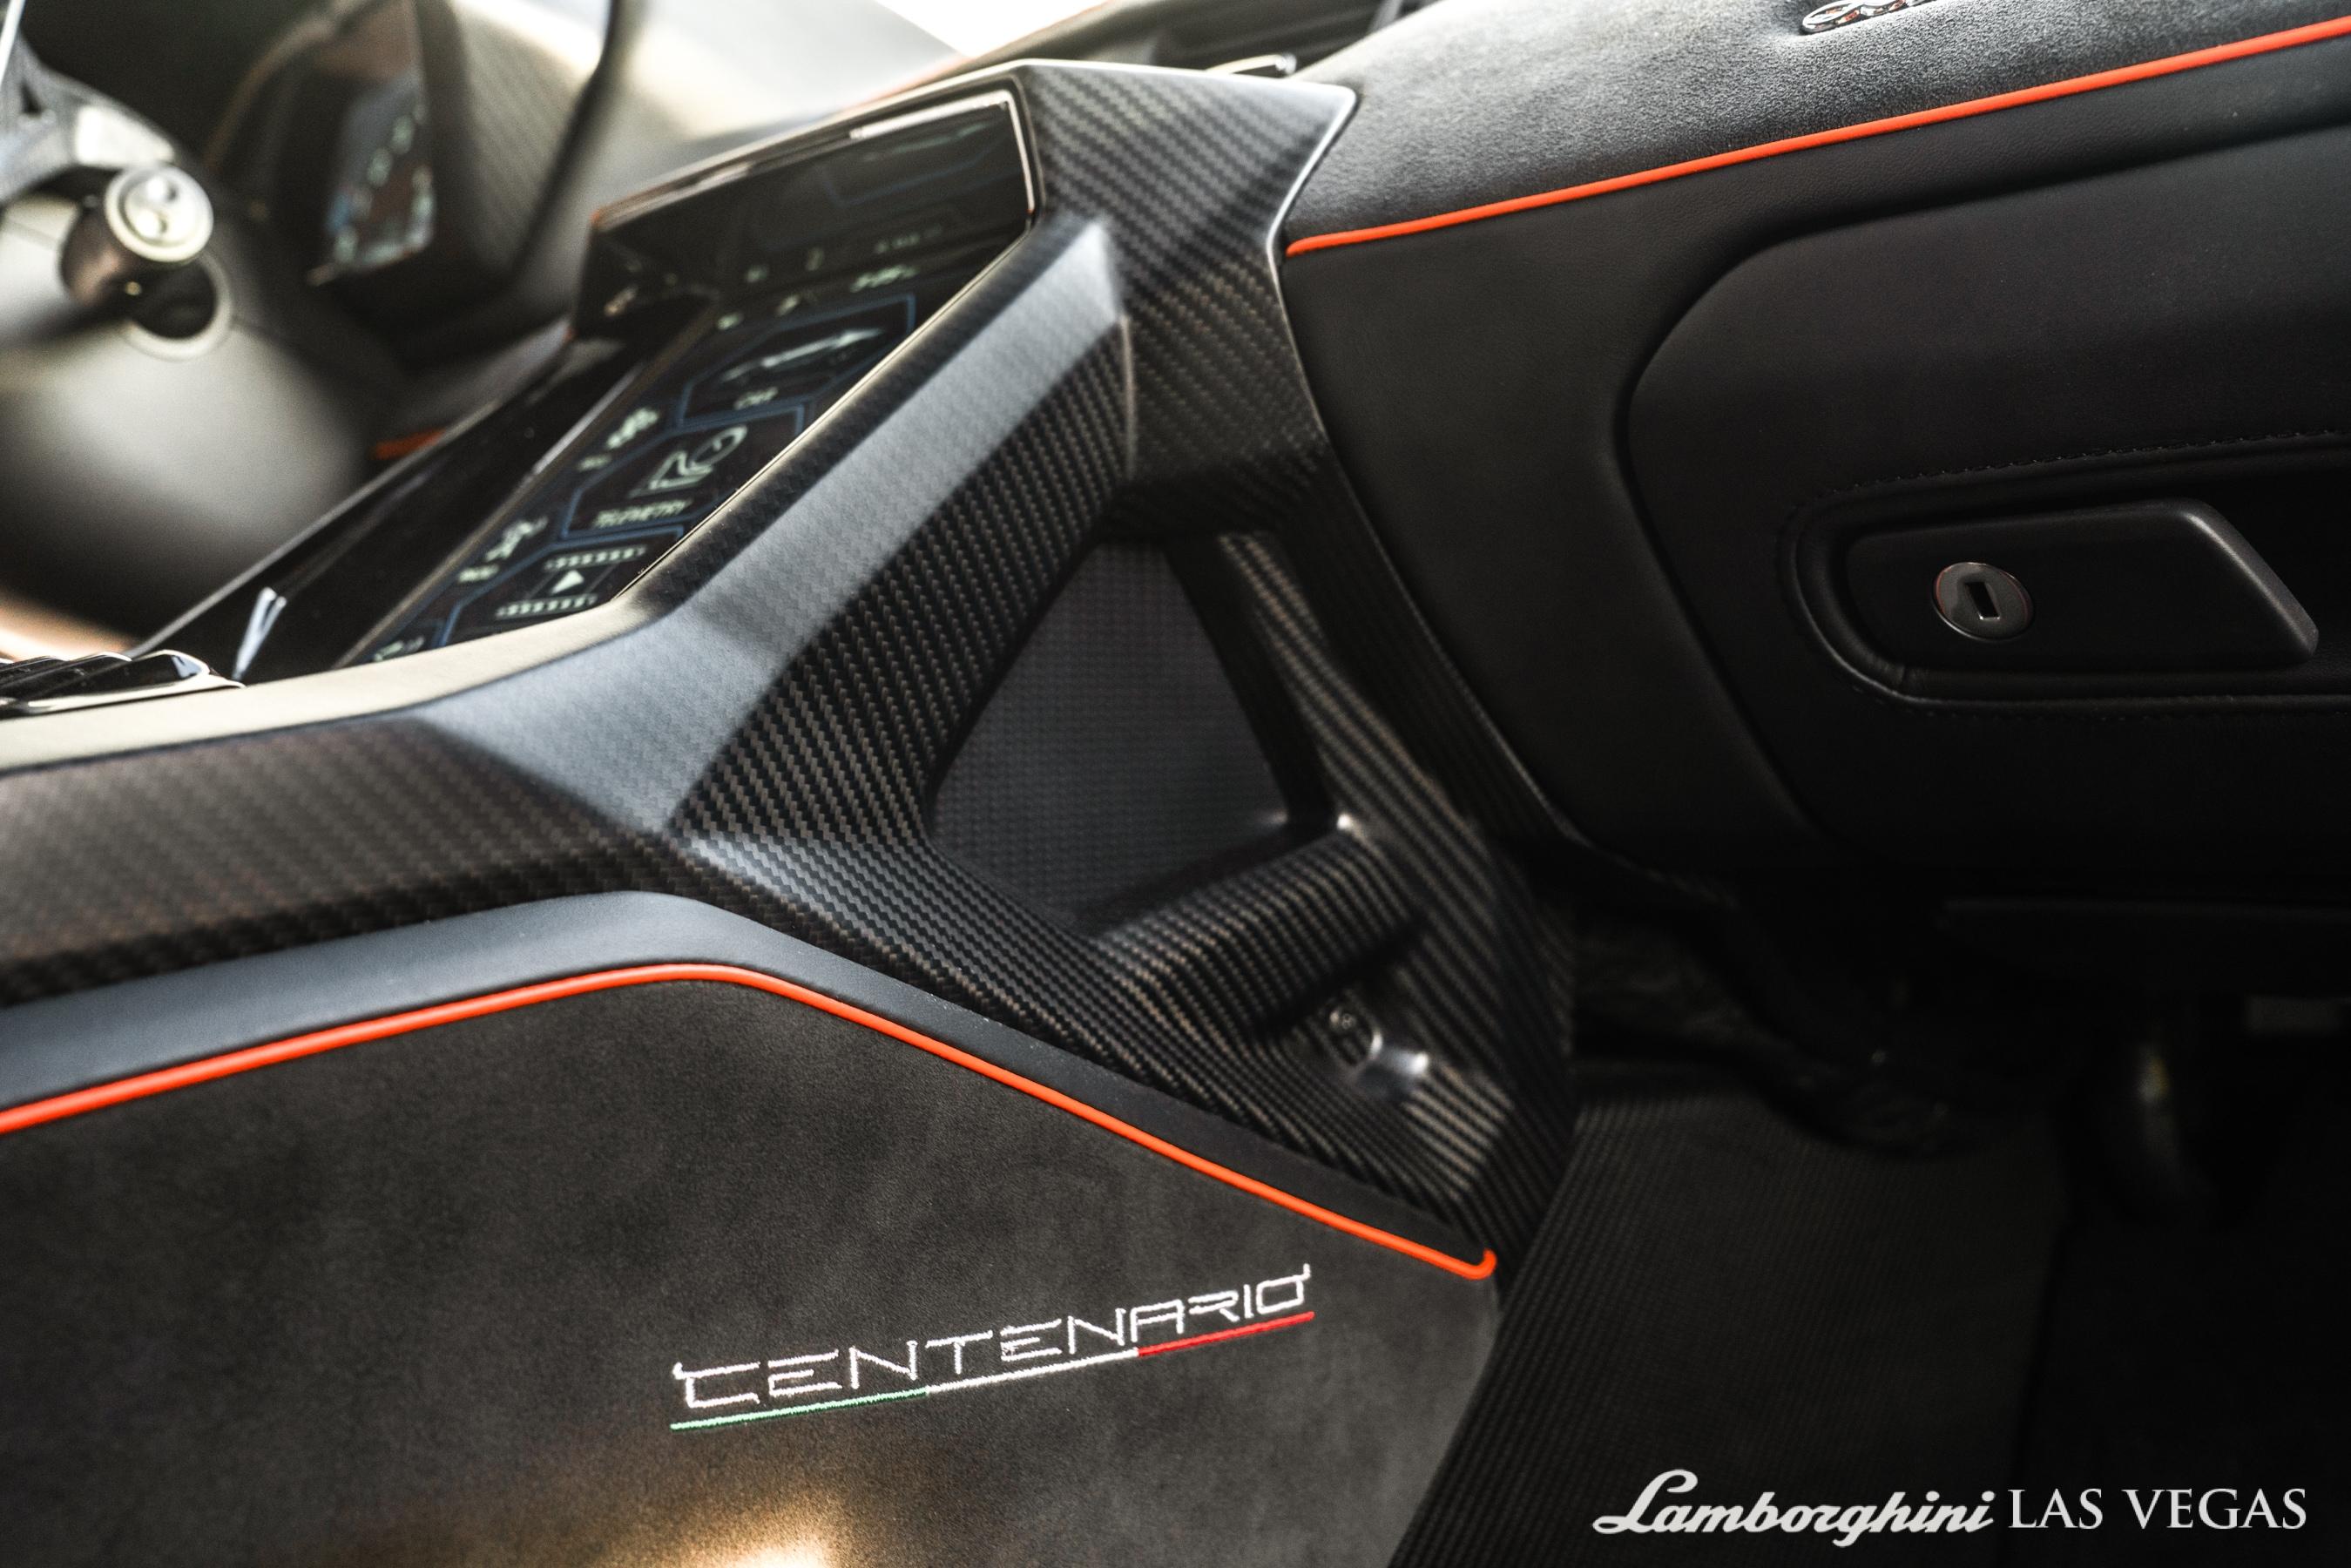 2017_Lamborghini_Centenario_for_sale_0002